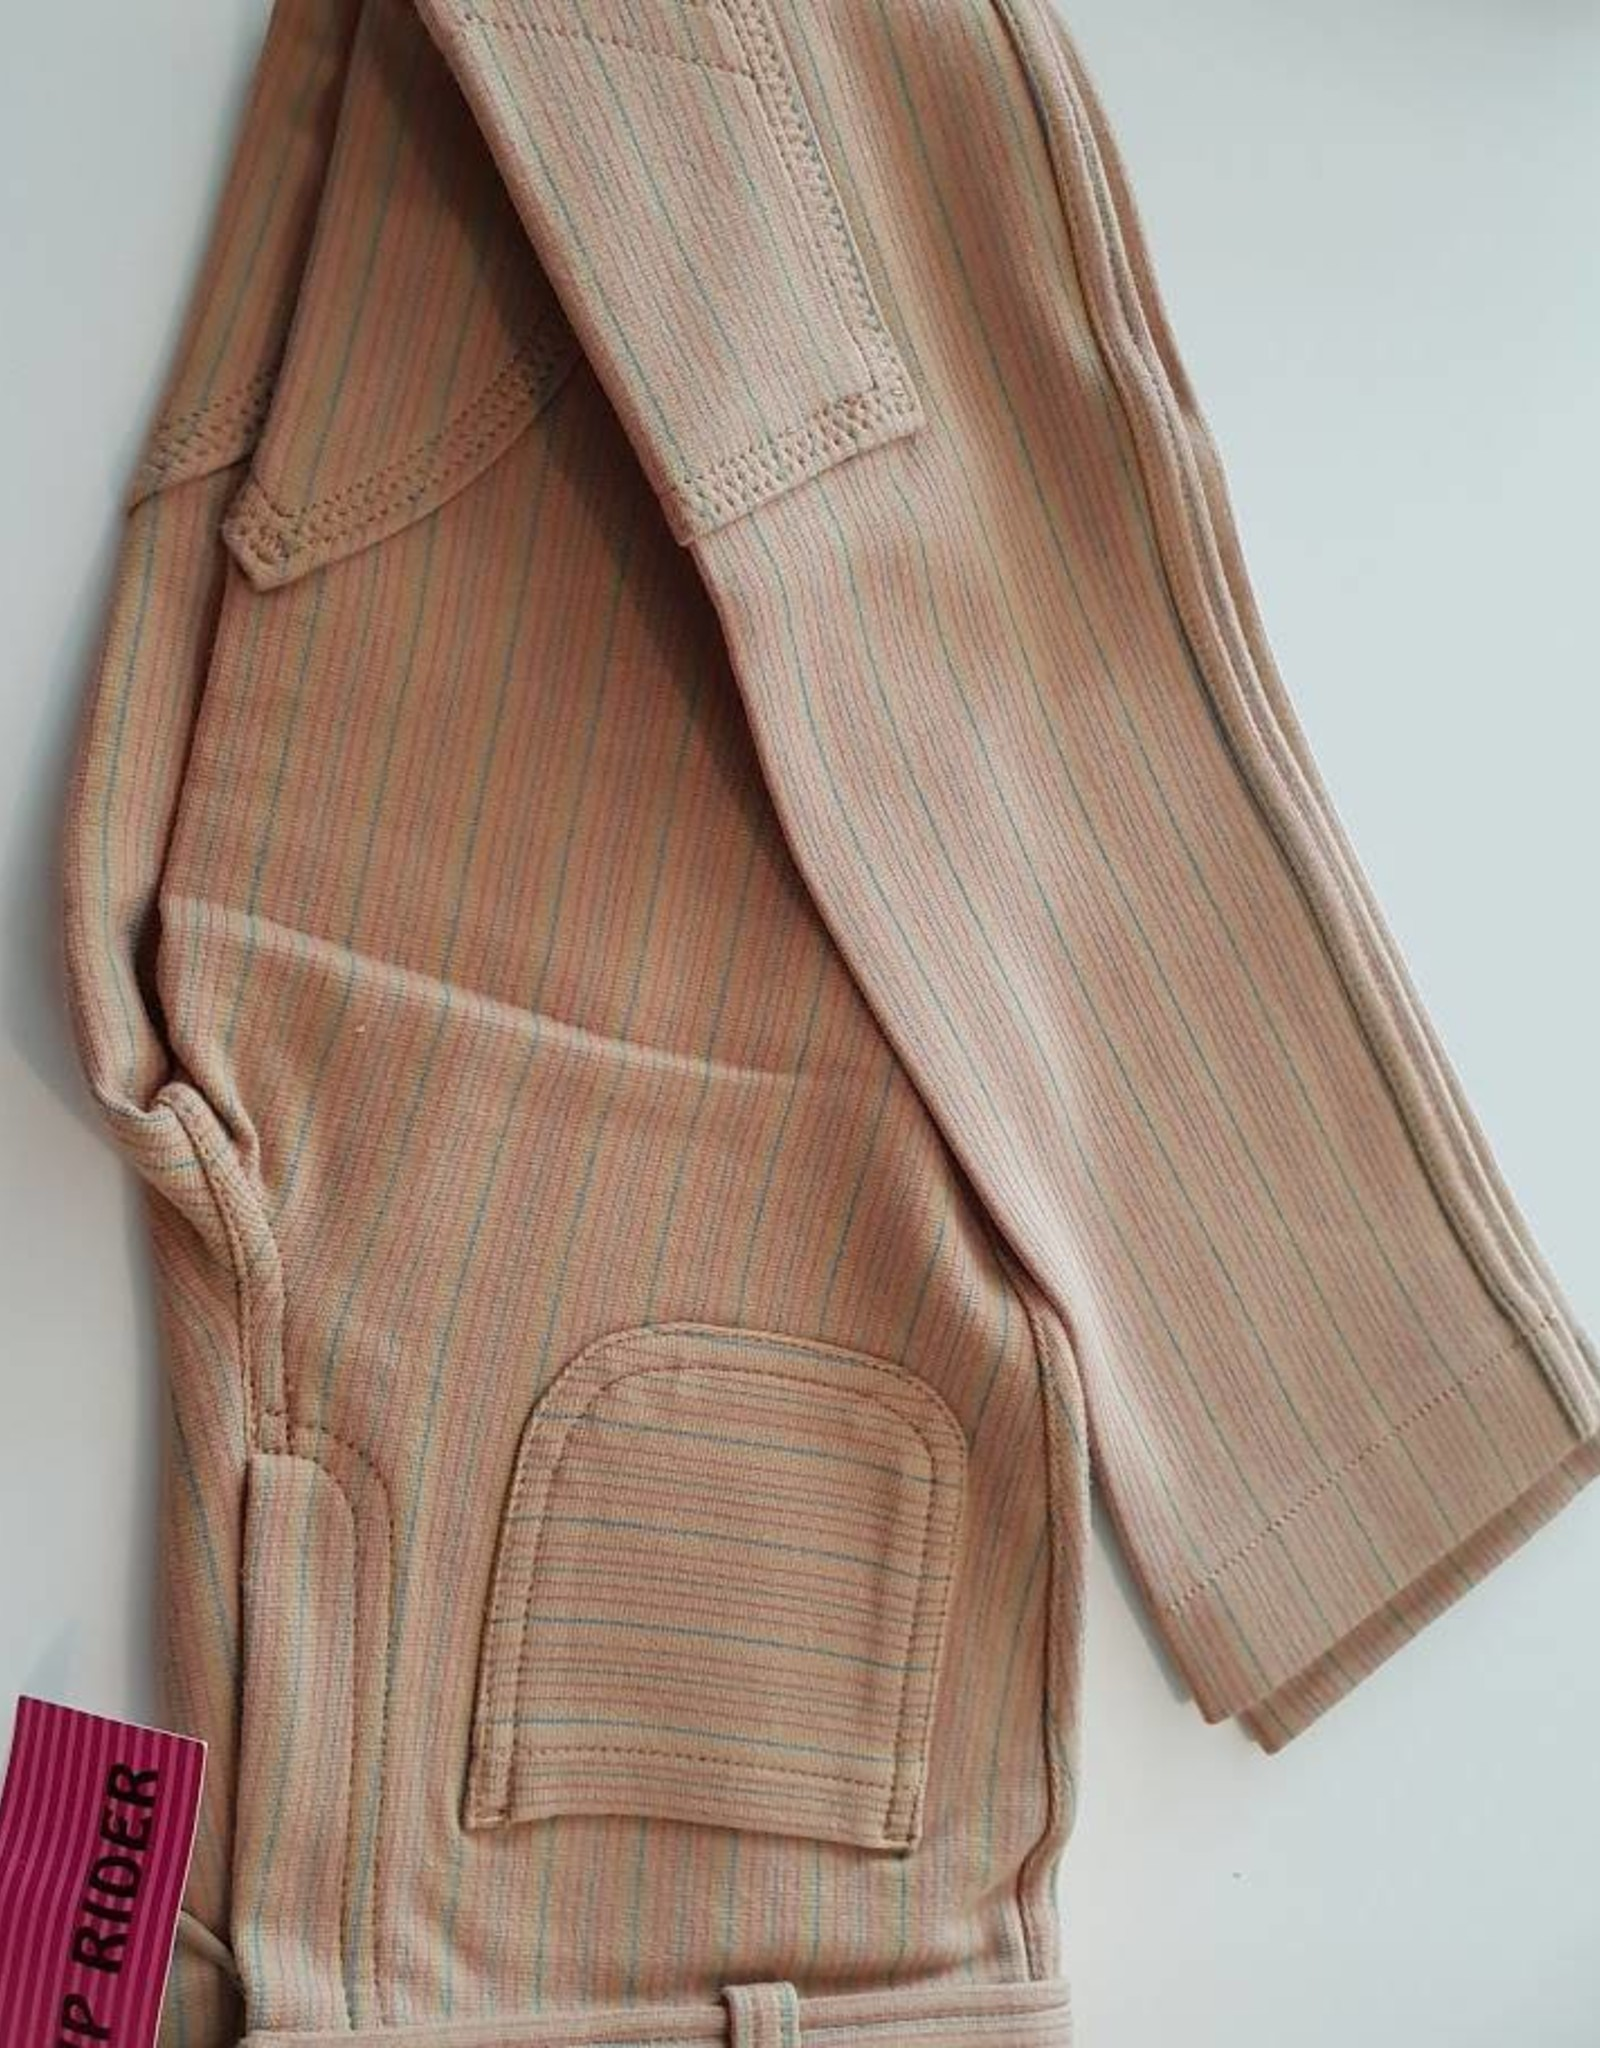 Windsor Apparel Jodhpur Hipster - Beige with Pink/Green Stripe - Childs Size 8